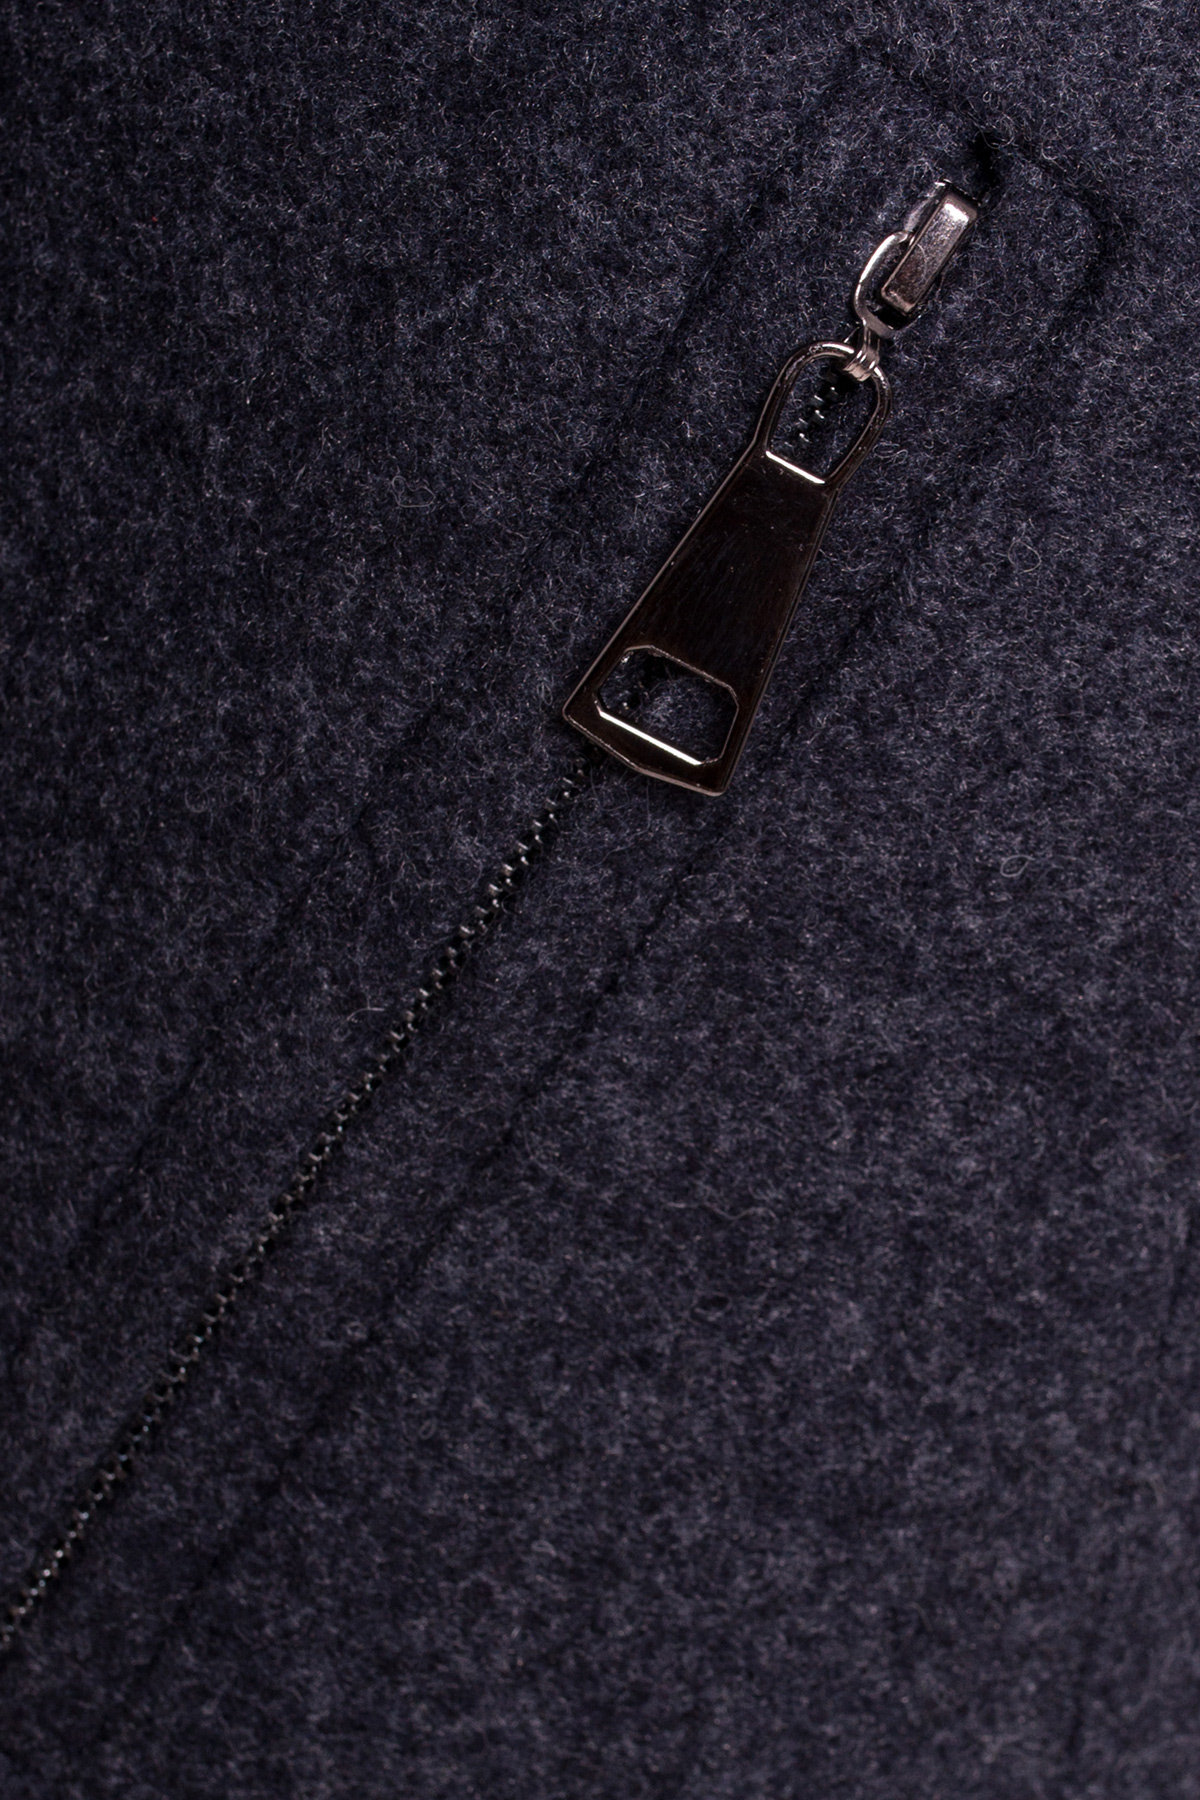 Пальто Лорин 4478 АРТ. 21567 Цвет: Темно-синий - фото 6, интернет магазин tm-modus.ru